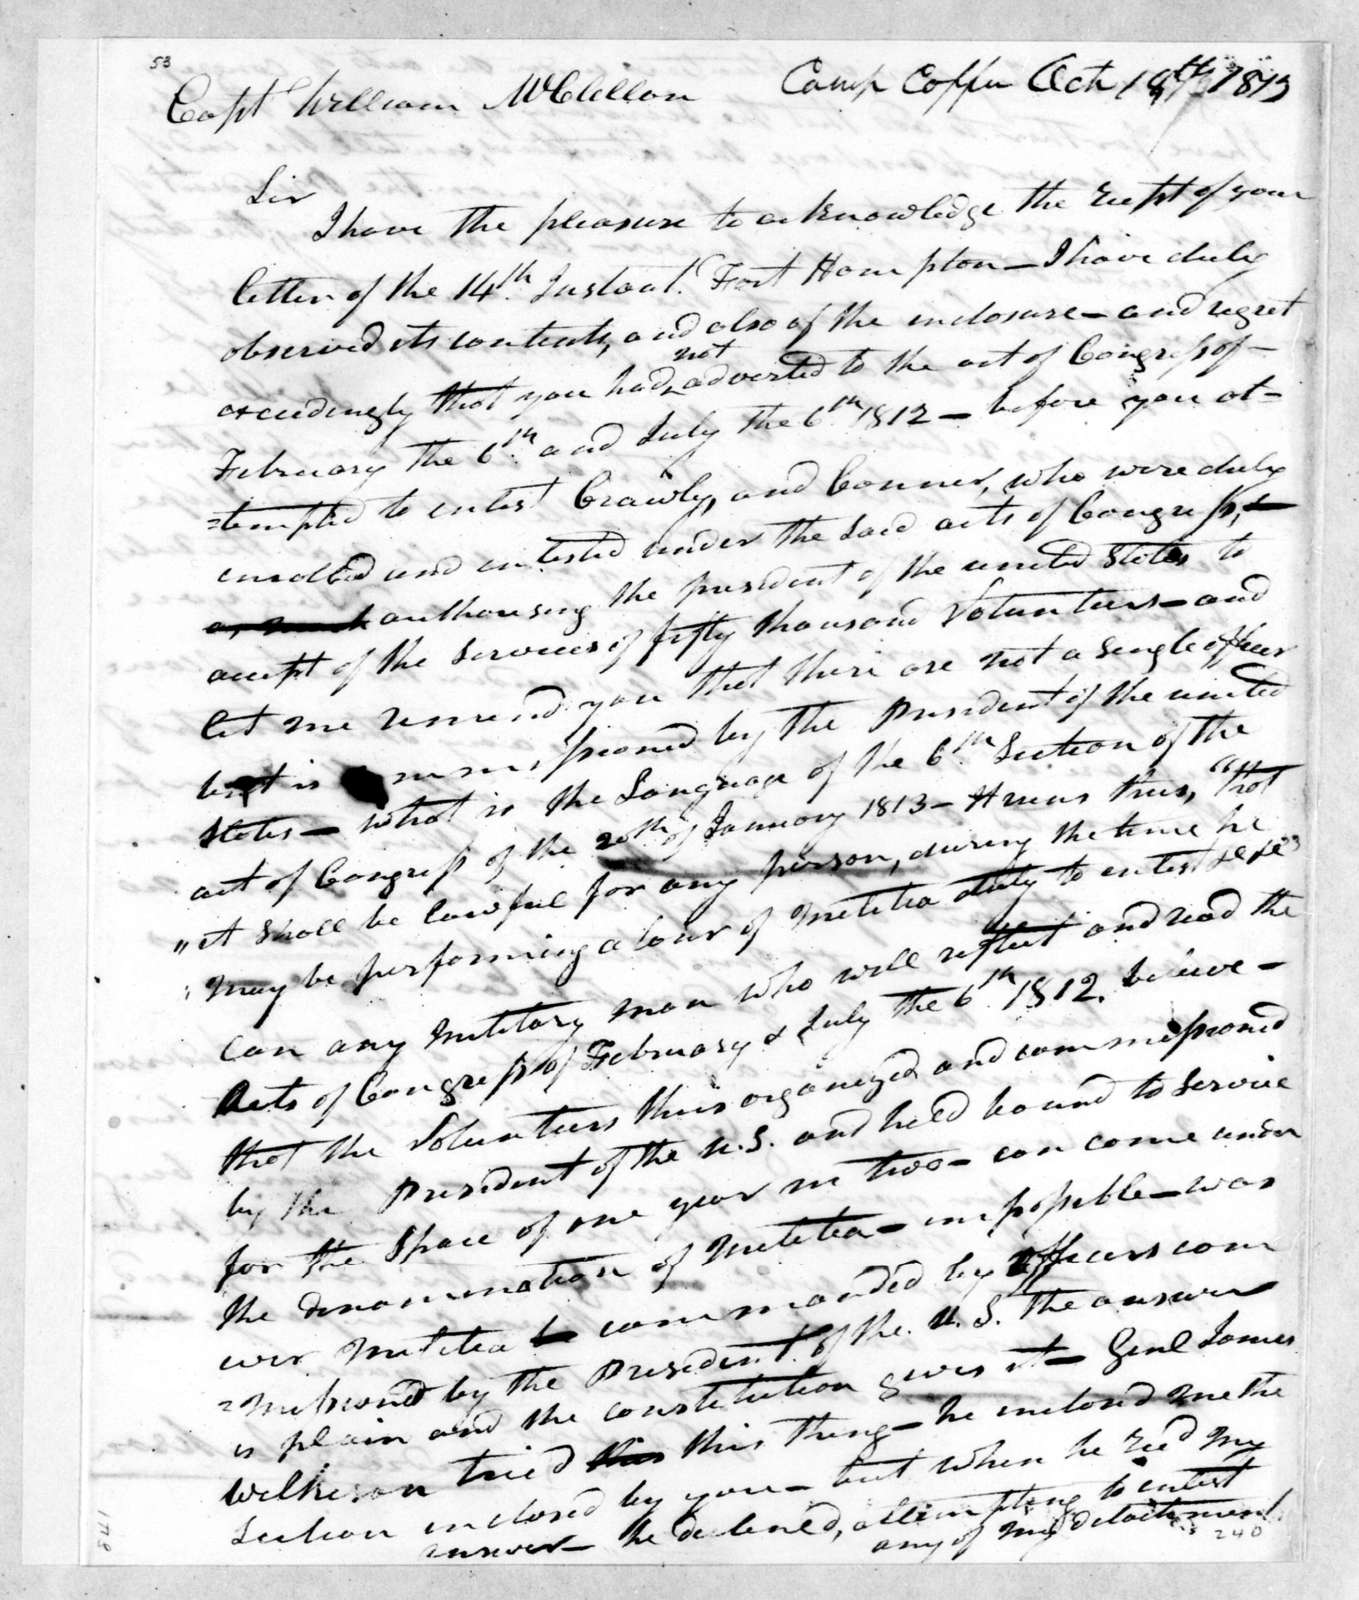 Andrew Jackson to William McClellan, October 18, 1813